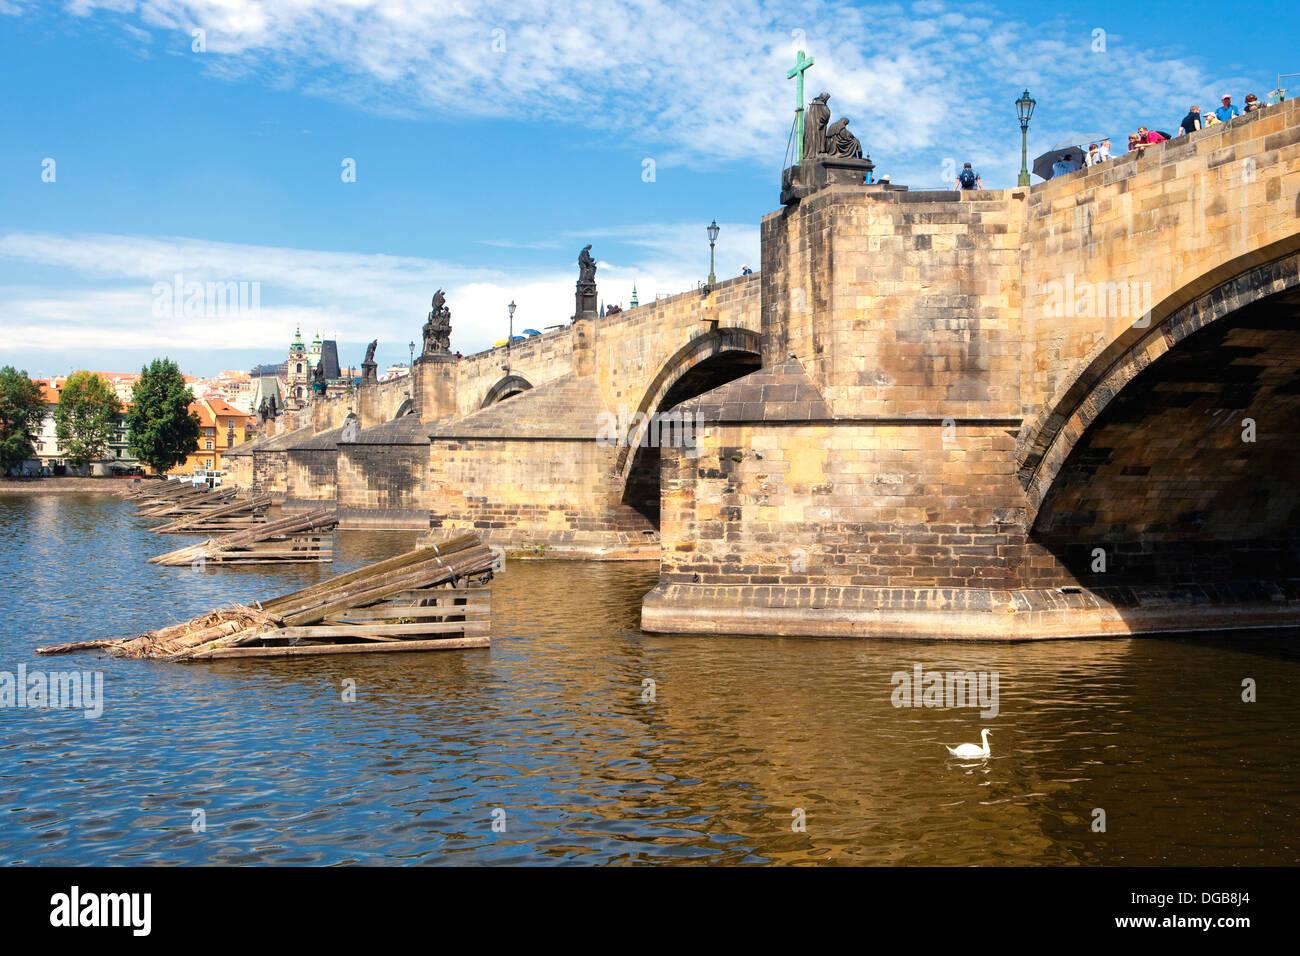 Tschechien, Prag - Sideview der Karlsbrücke Stockbild